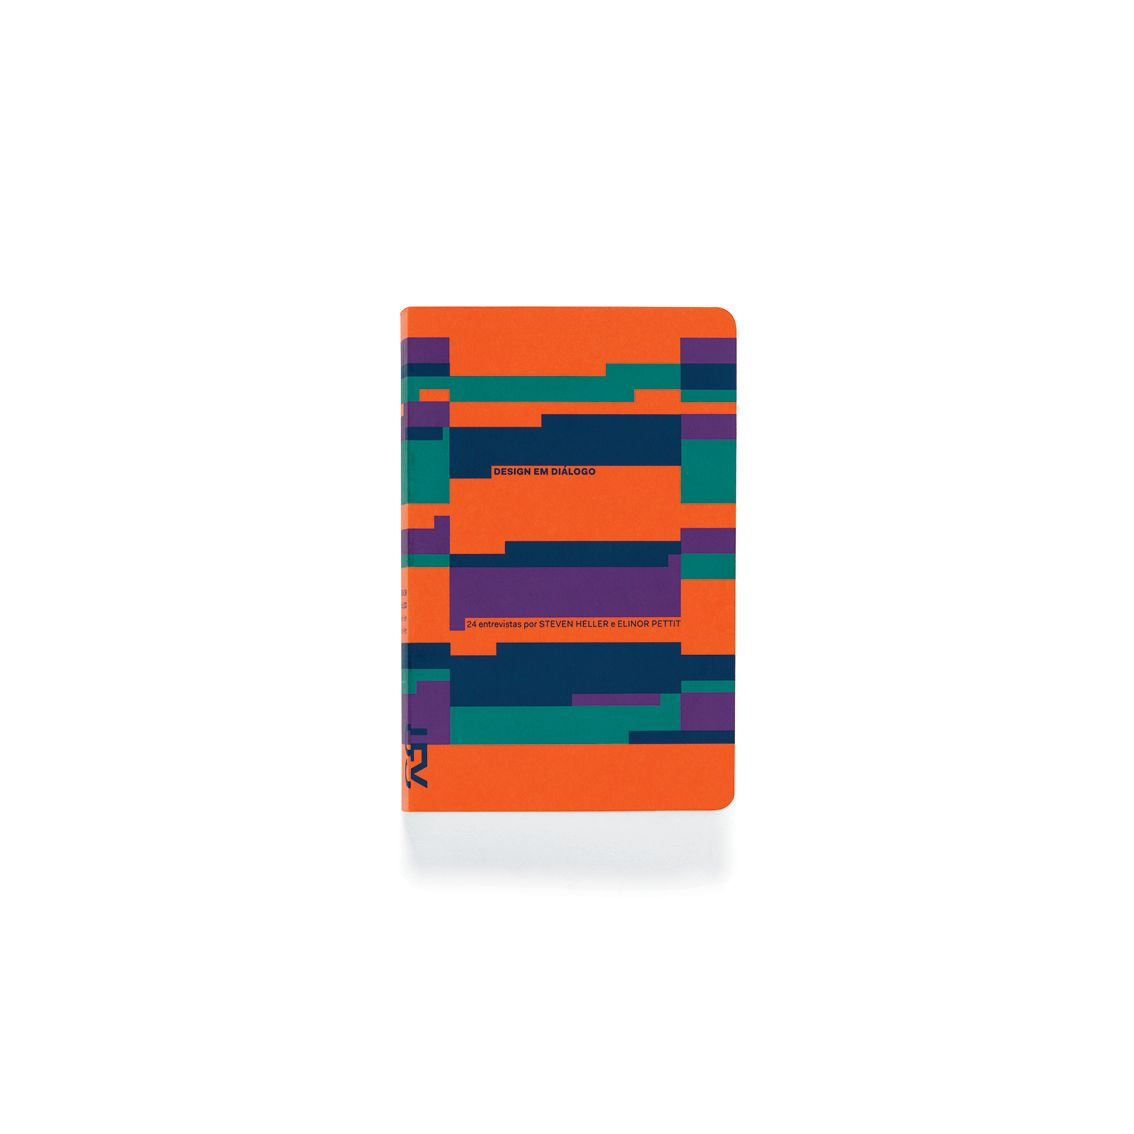 Design em diálogoElinor Petit, Steven HellerCosac Naify2013com Elaine Ramos